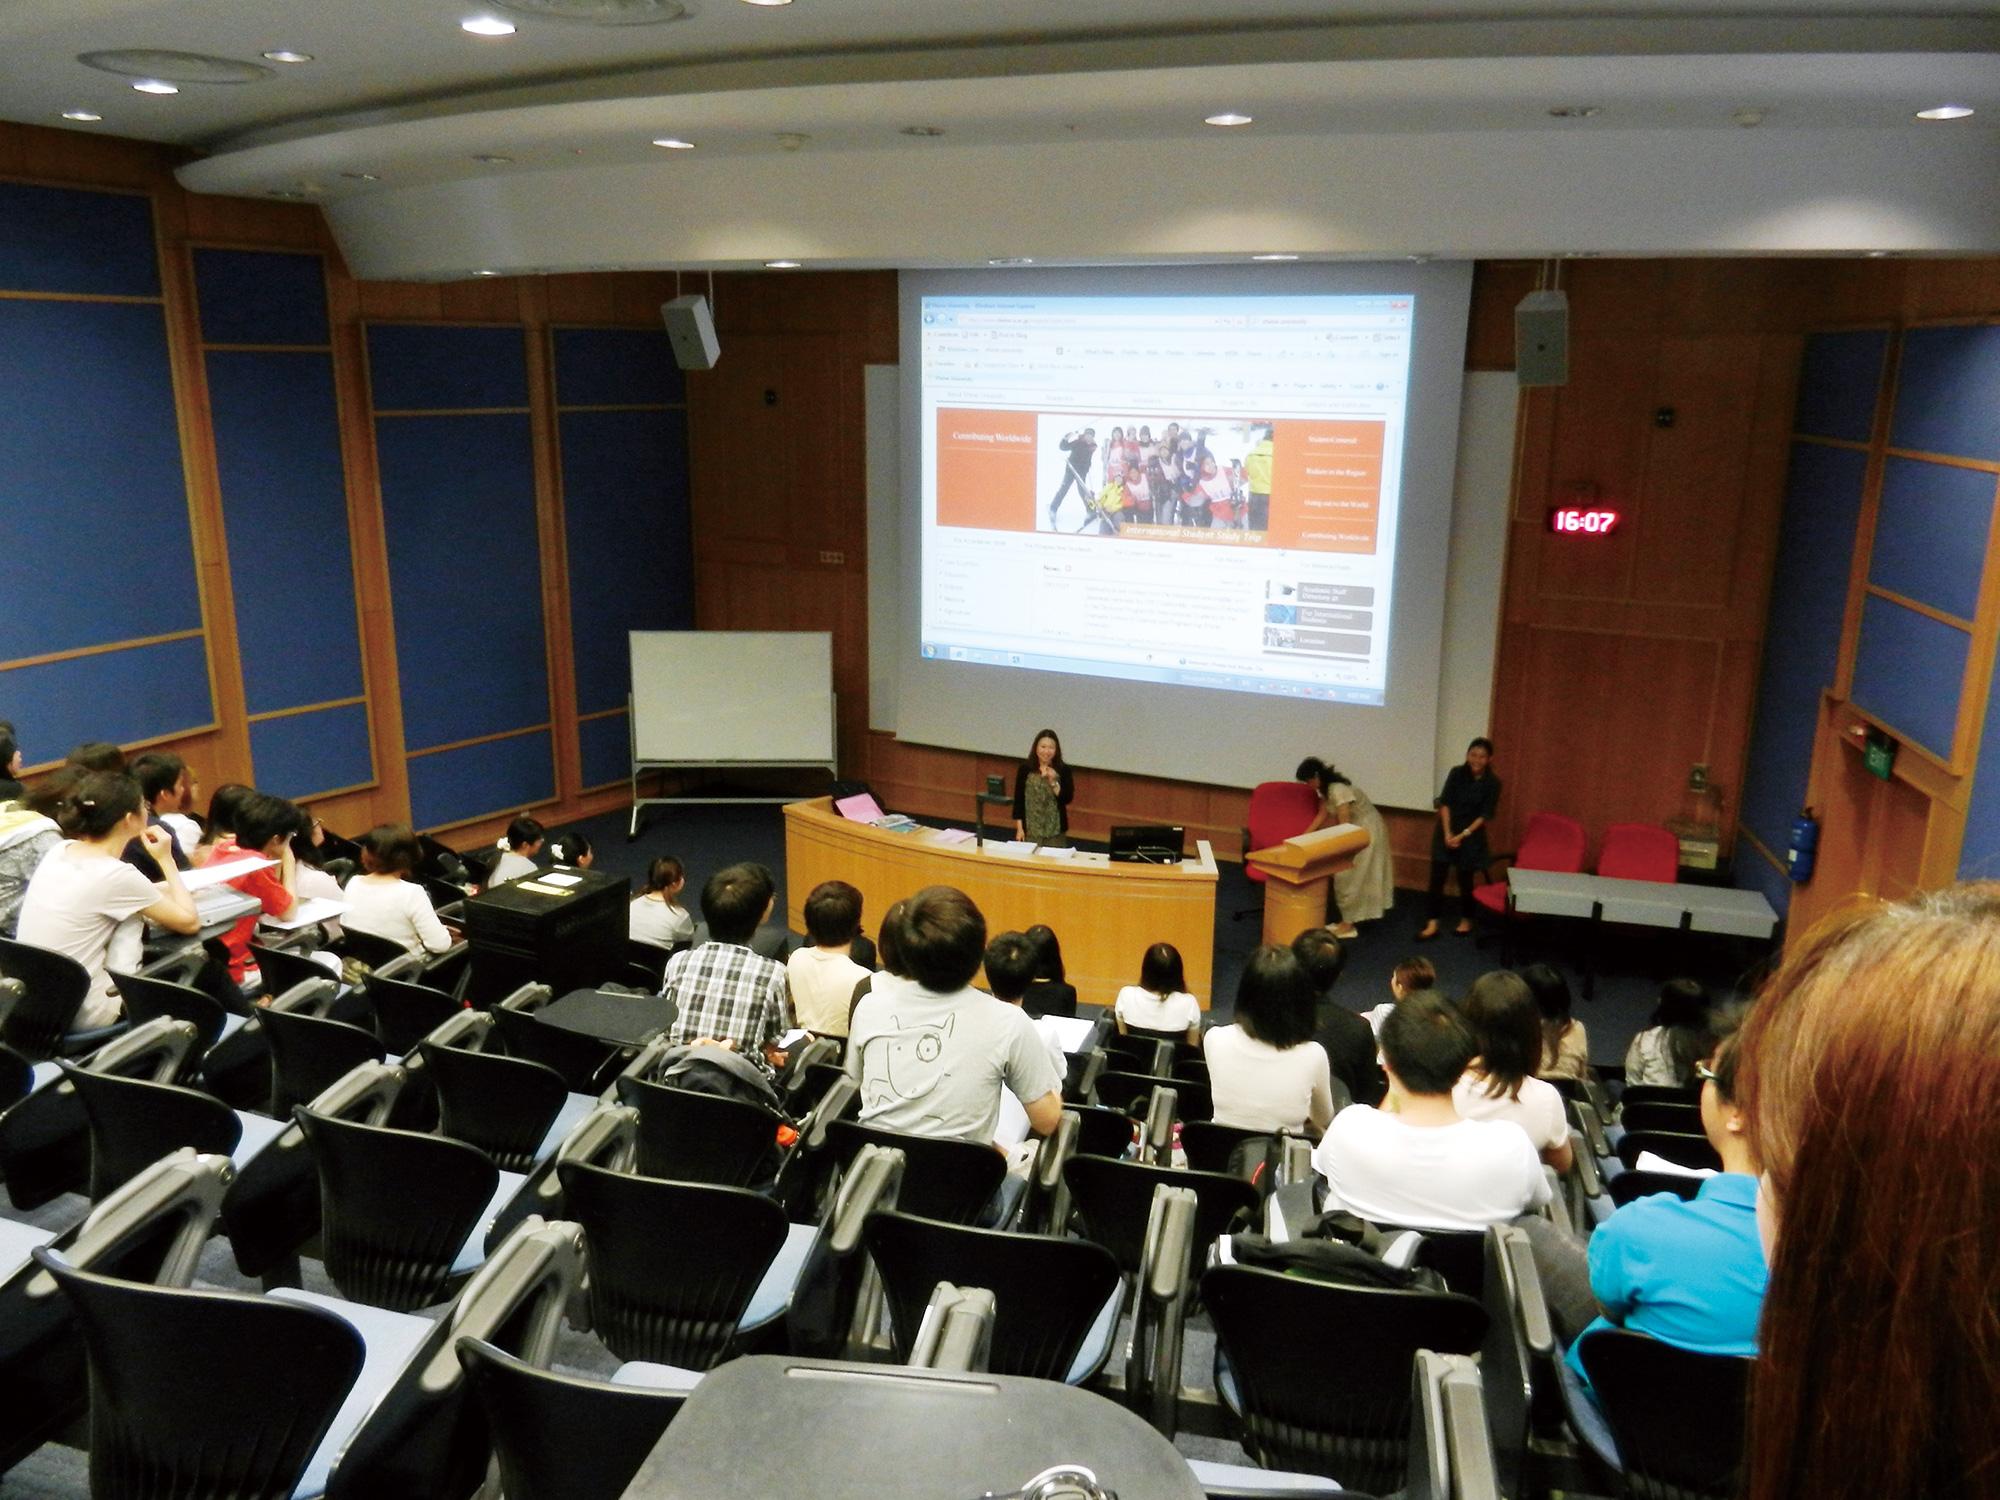 International exchange at the National University of Singapore